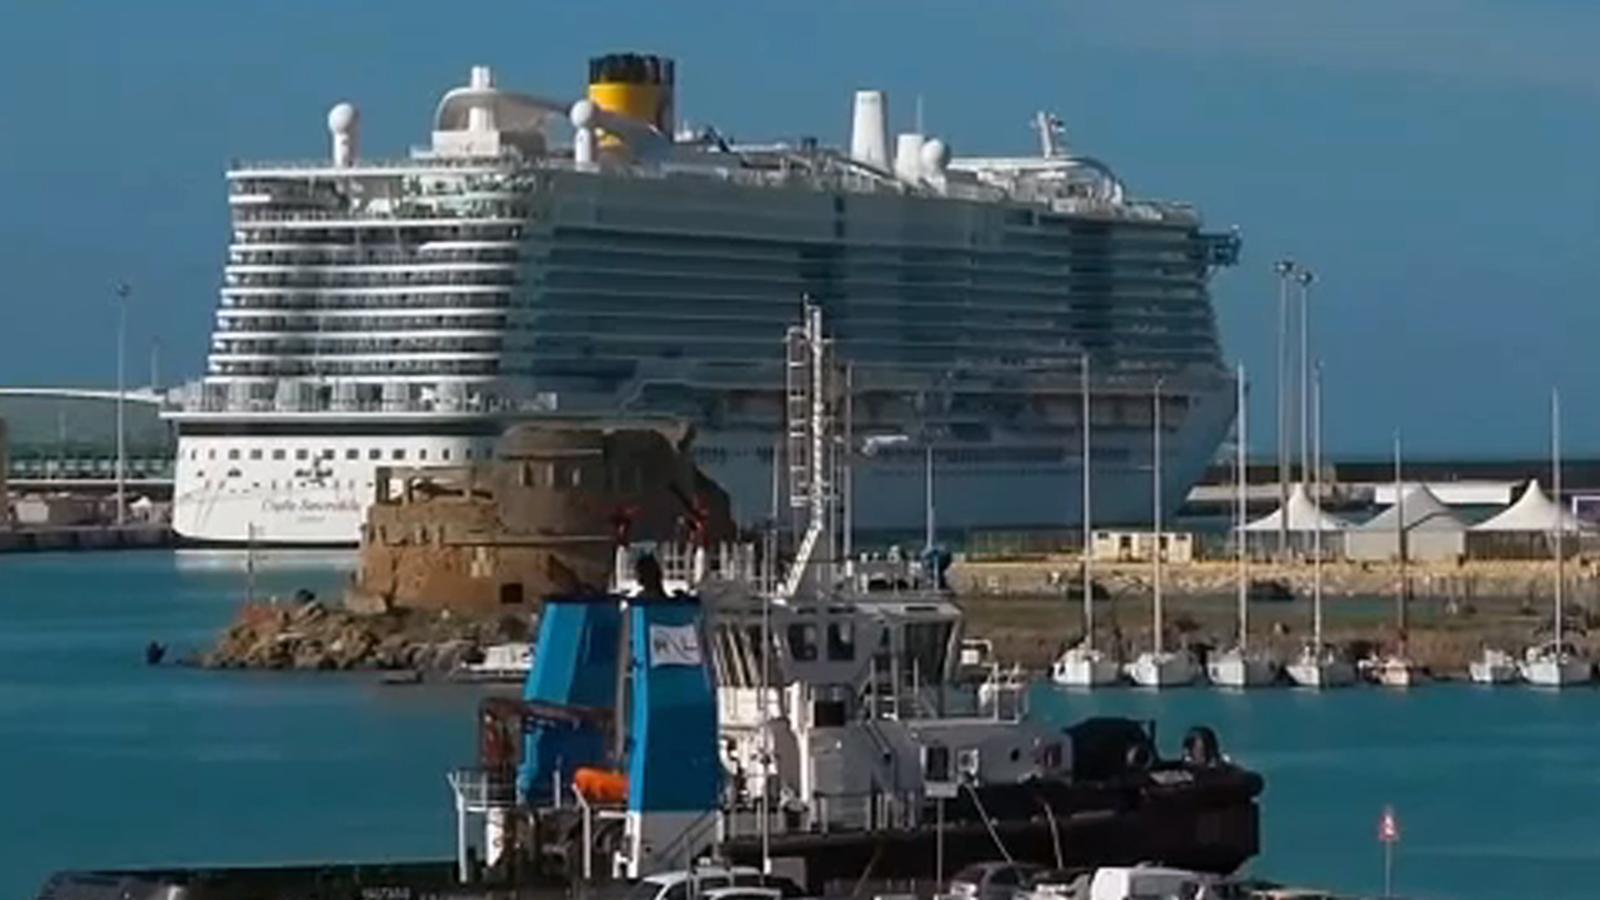 Coronavirus  7 000 Stuck On Cruise Ship Off Italian Coast Amid Outbreak Concerns